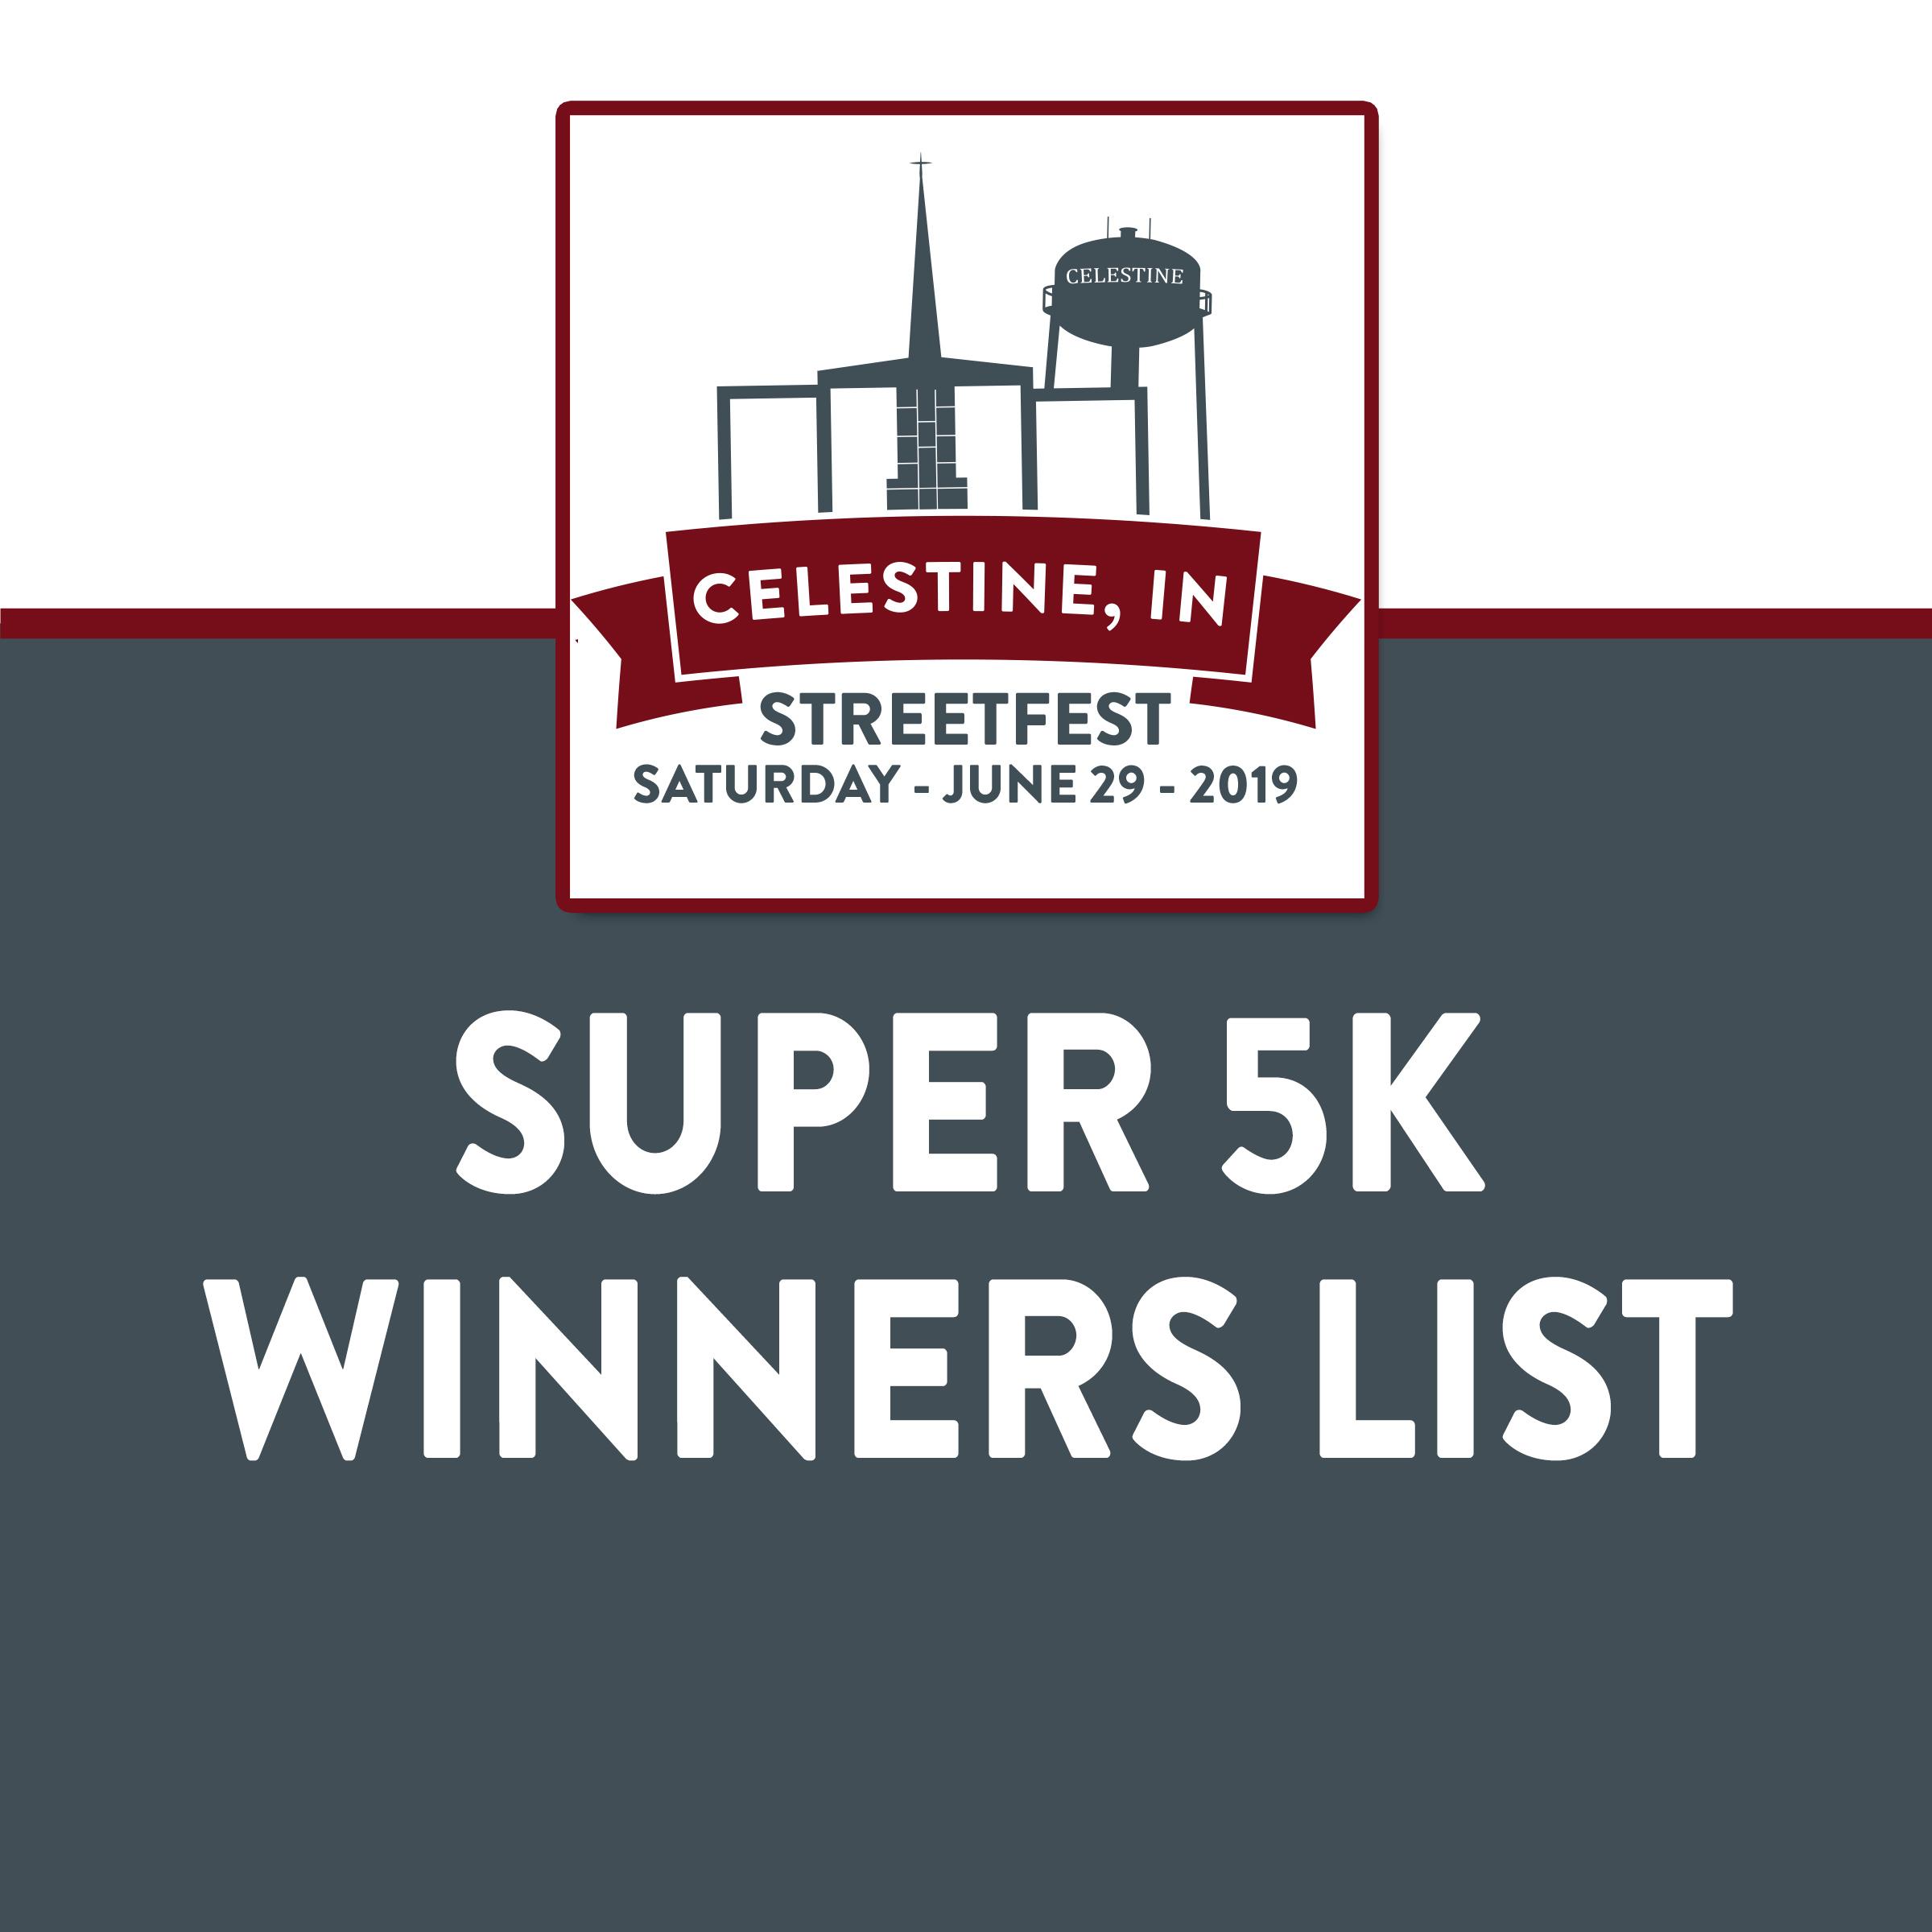 Super-5K-winners-list.jpg